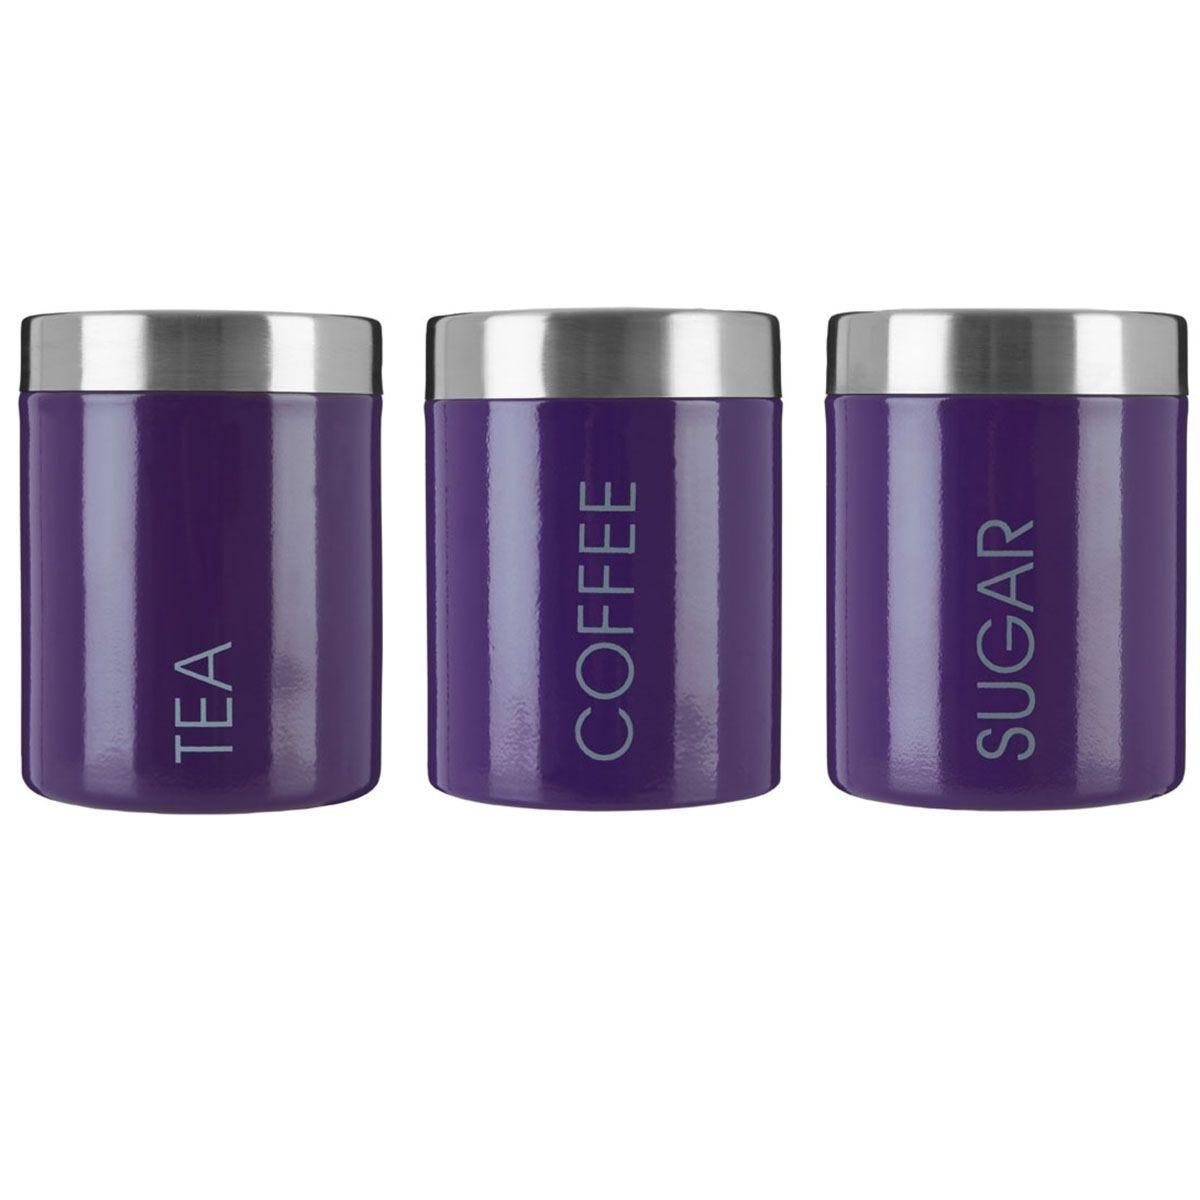 Premier Housewares Purple Liberty Canisters - Set of 3